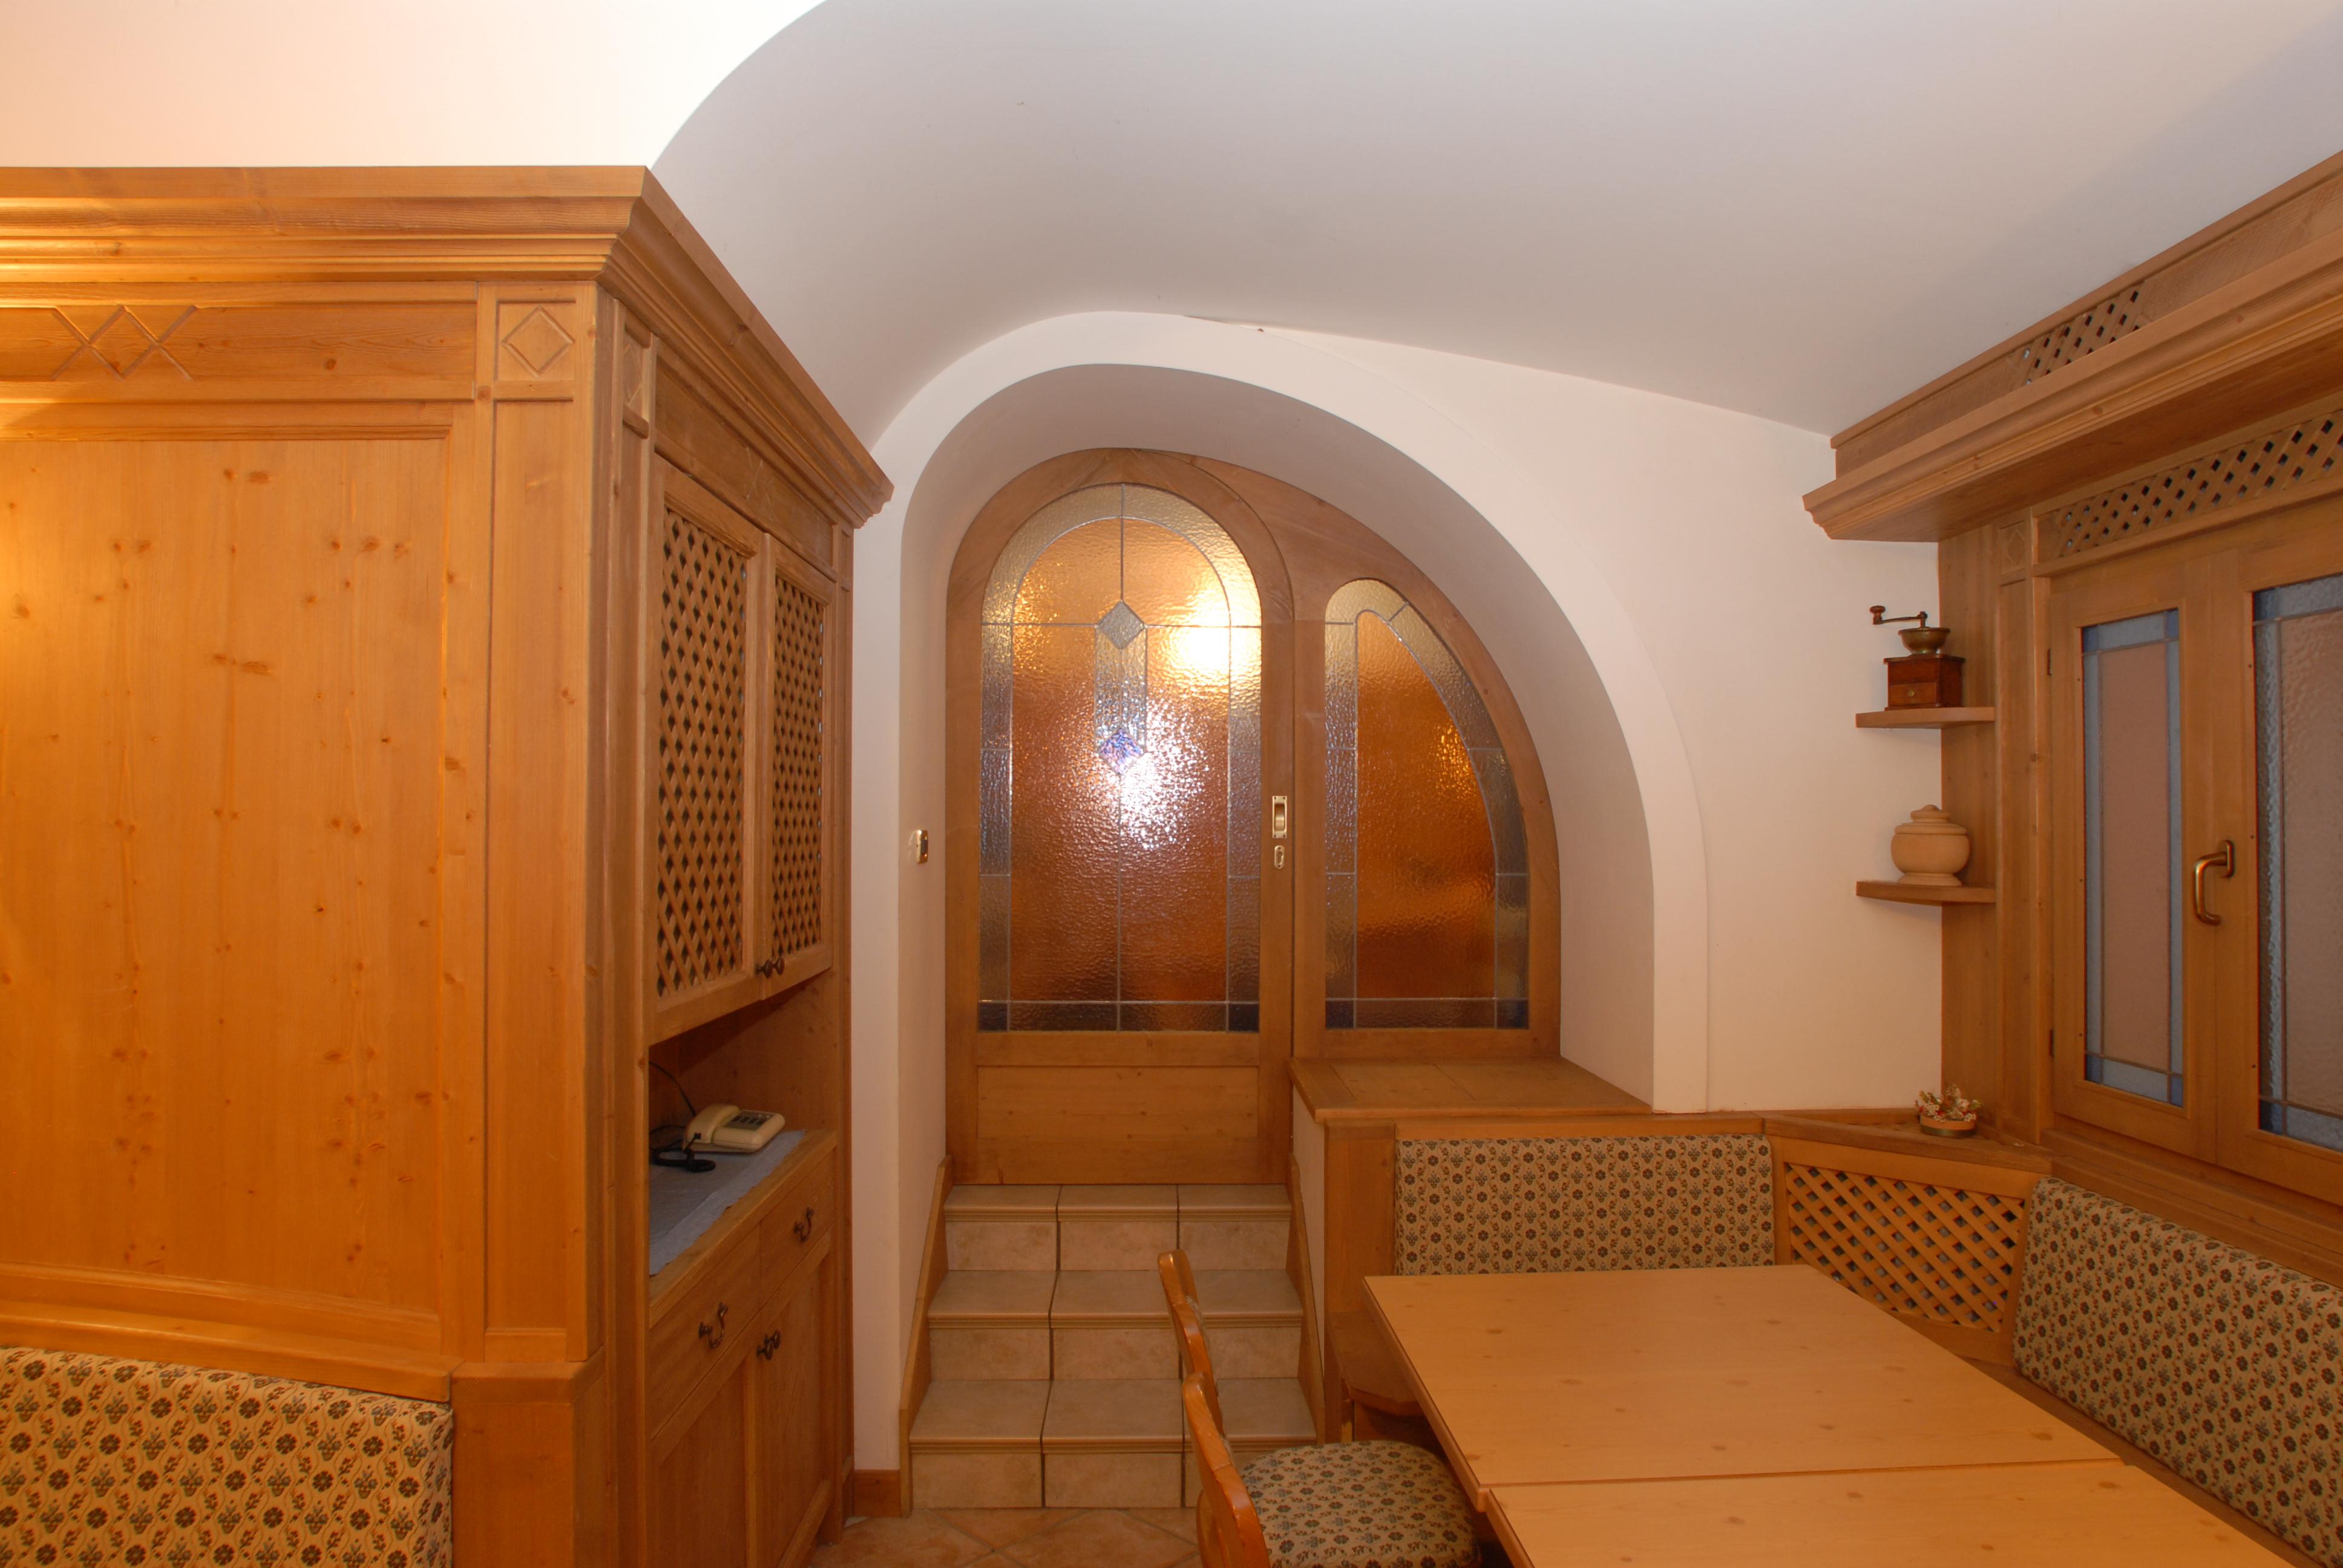 Tavernetta in legno di abete